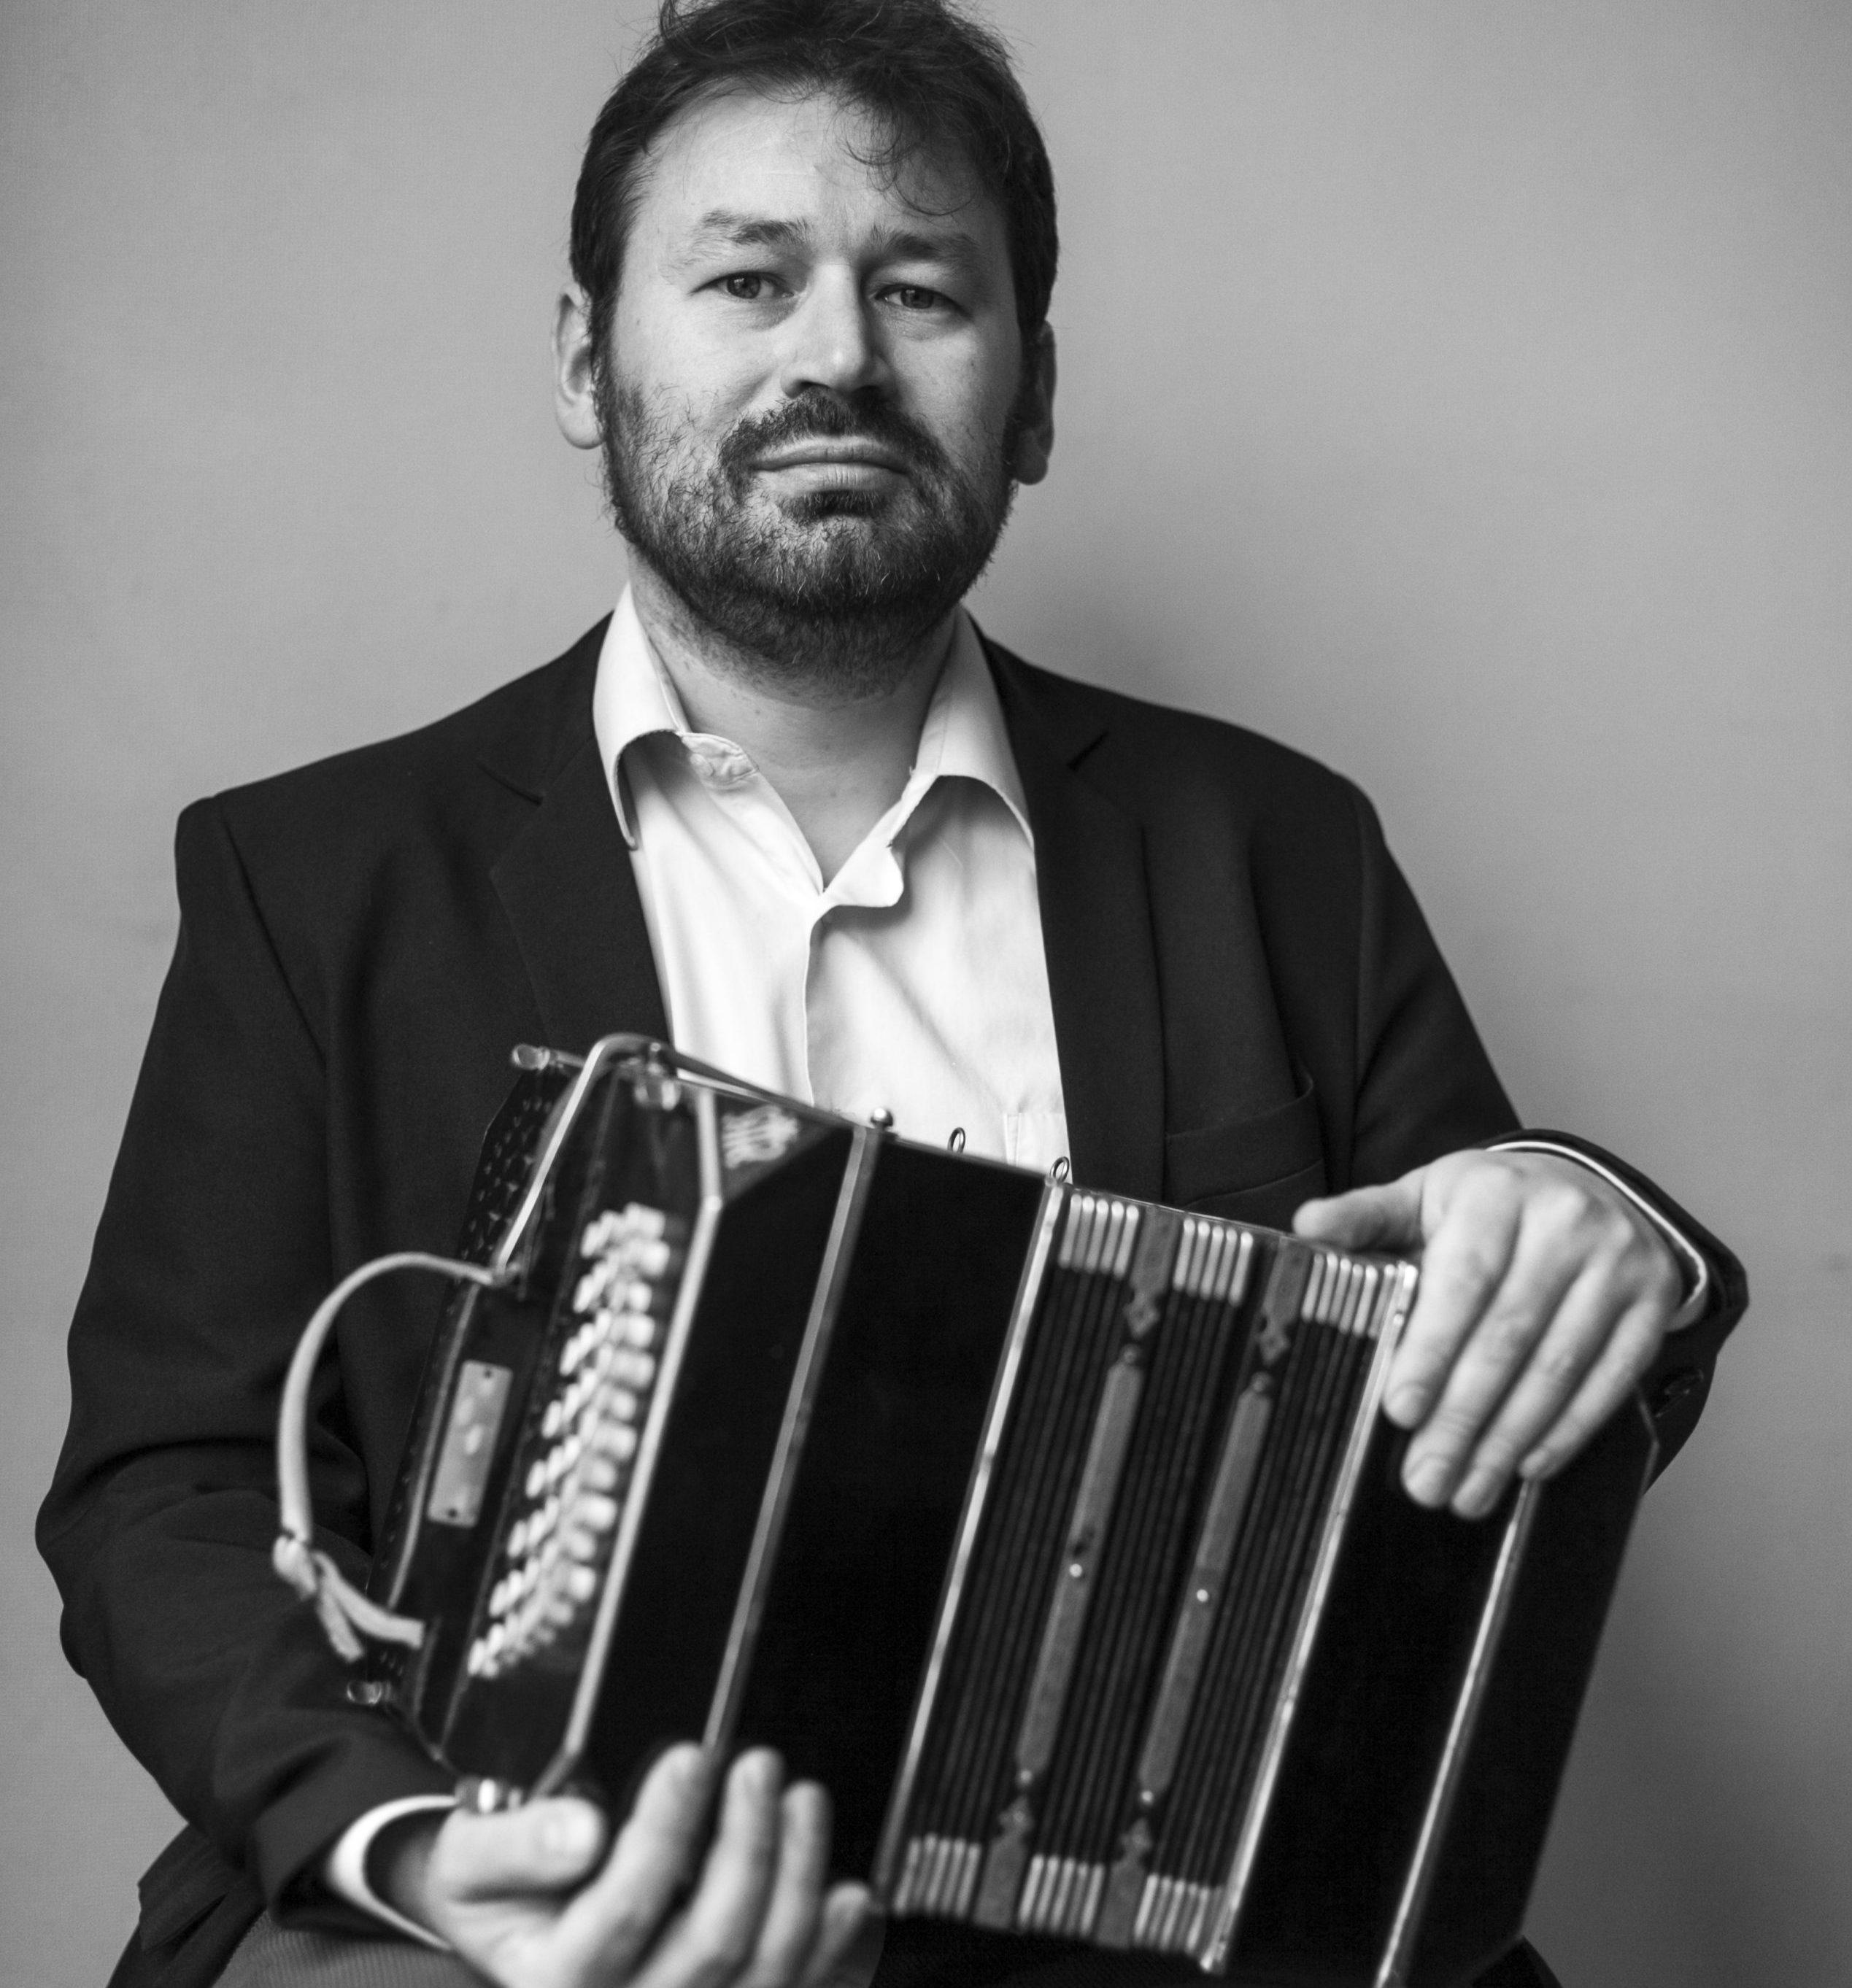 Alfonso Covarrubias